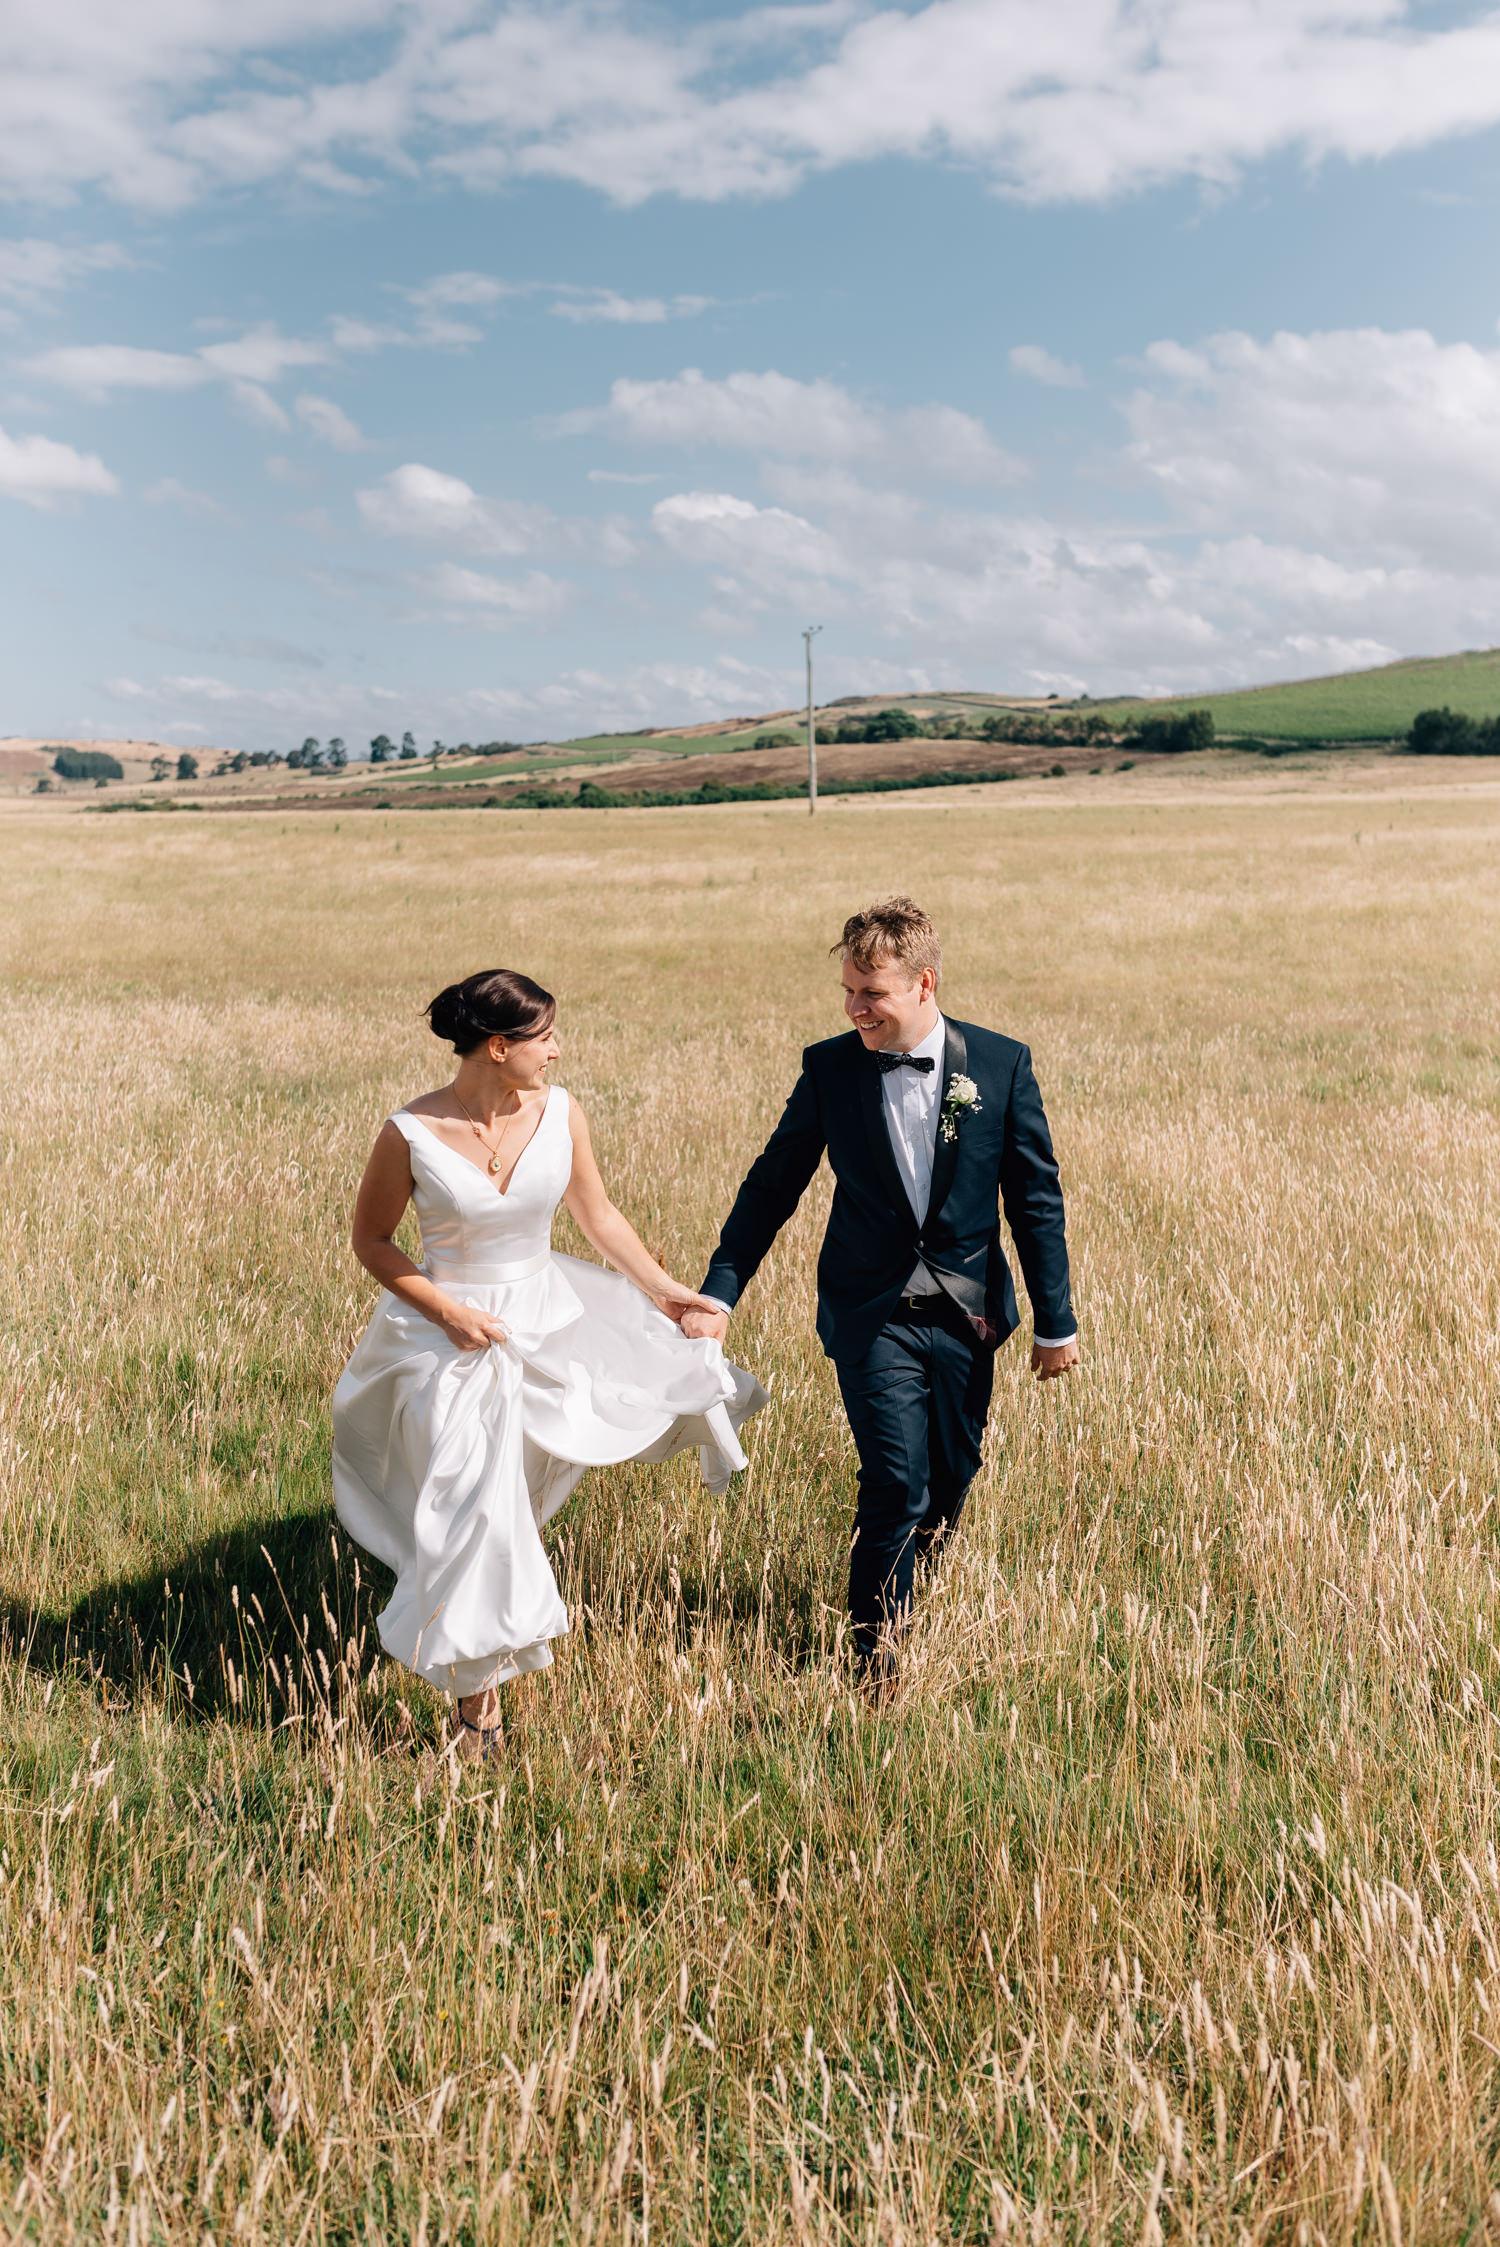 Josef-Chromy-Wedding-Photographer-68.jpg